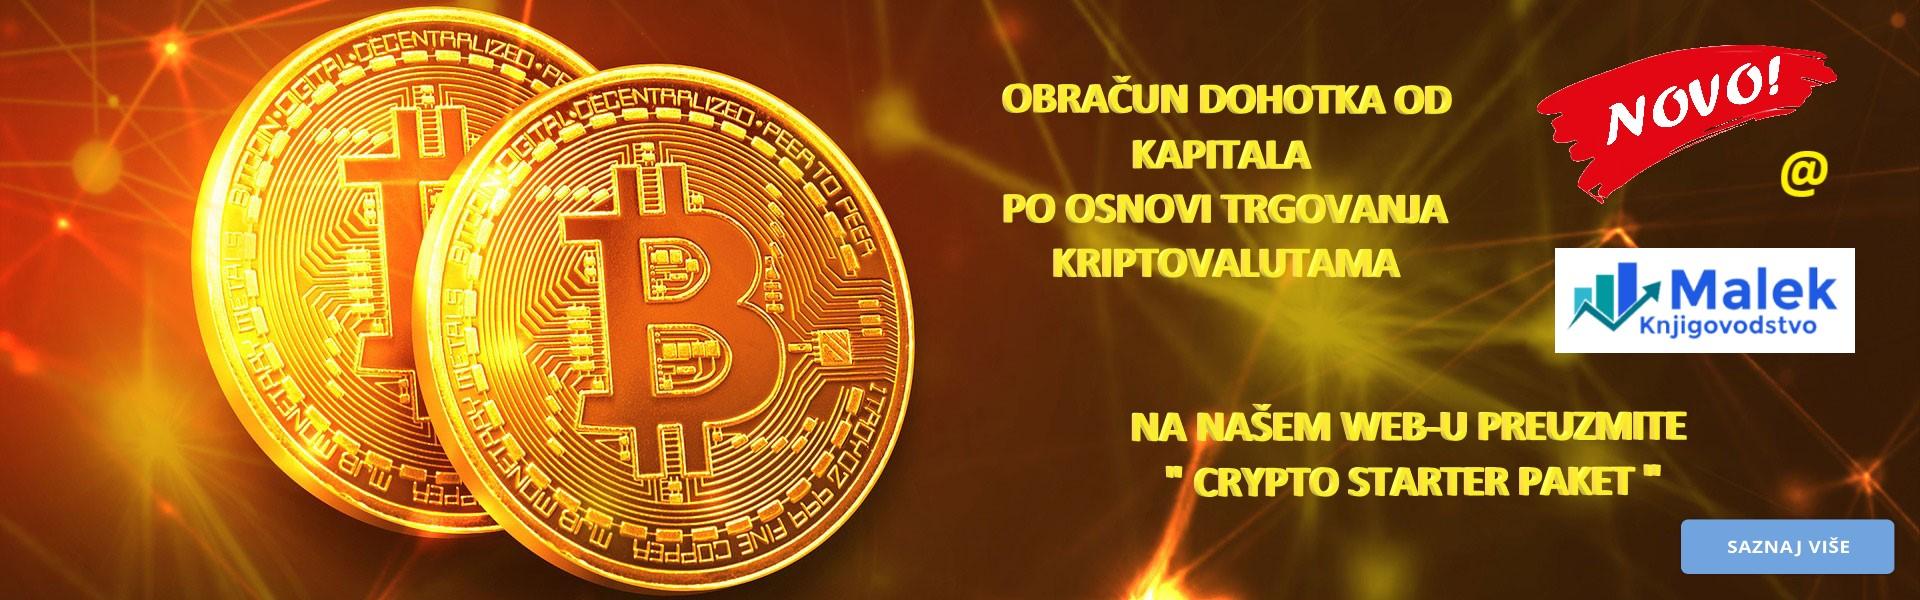 crypto_starter_paket